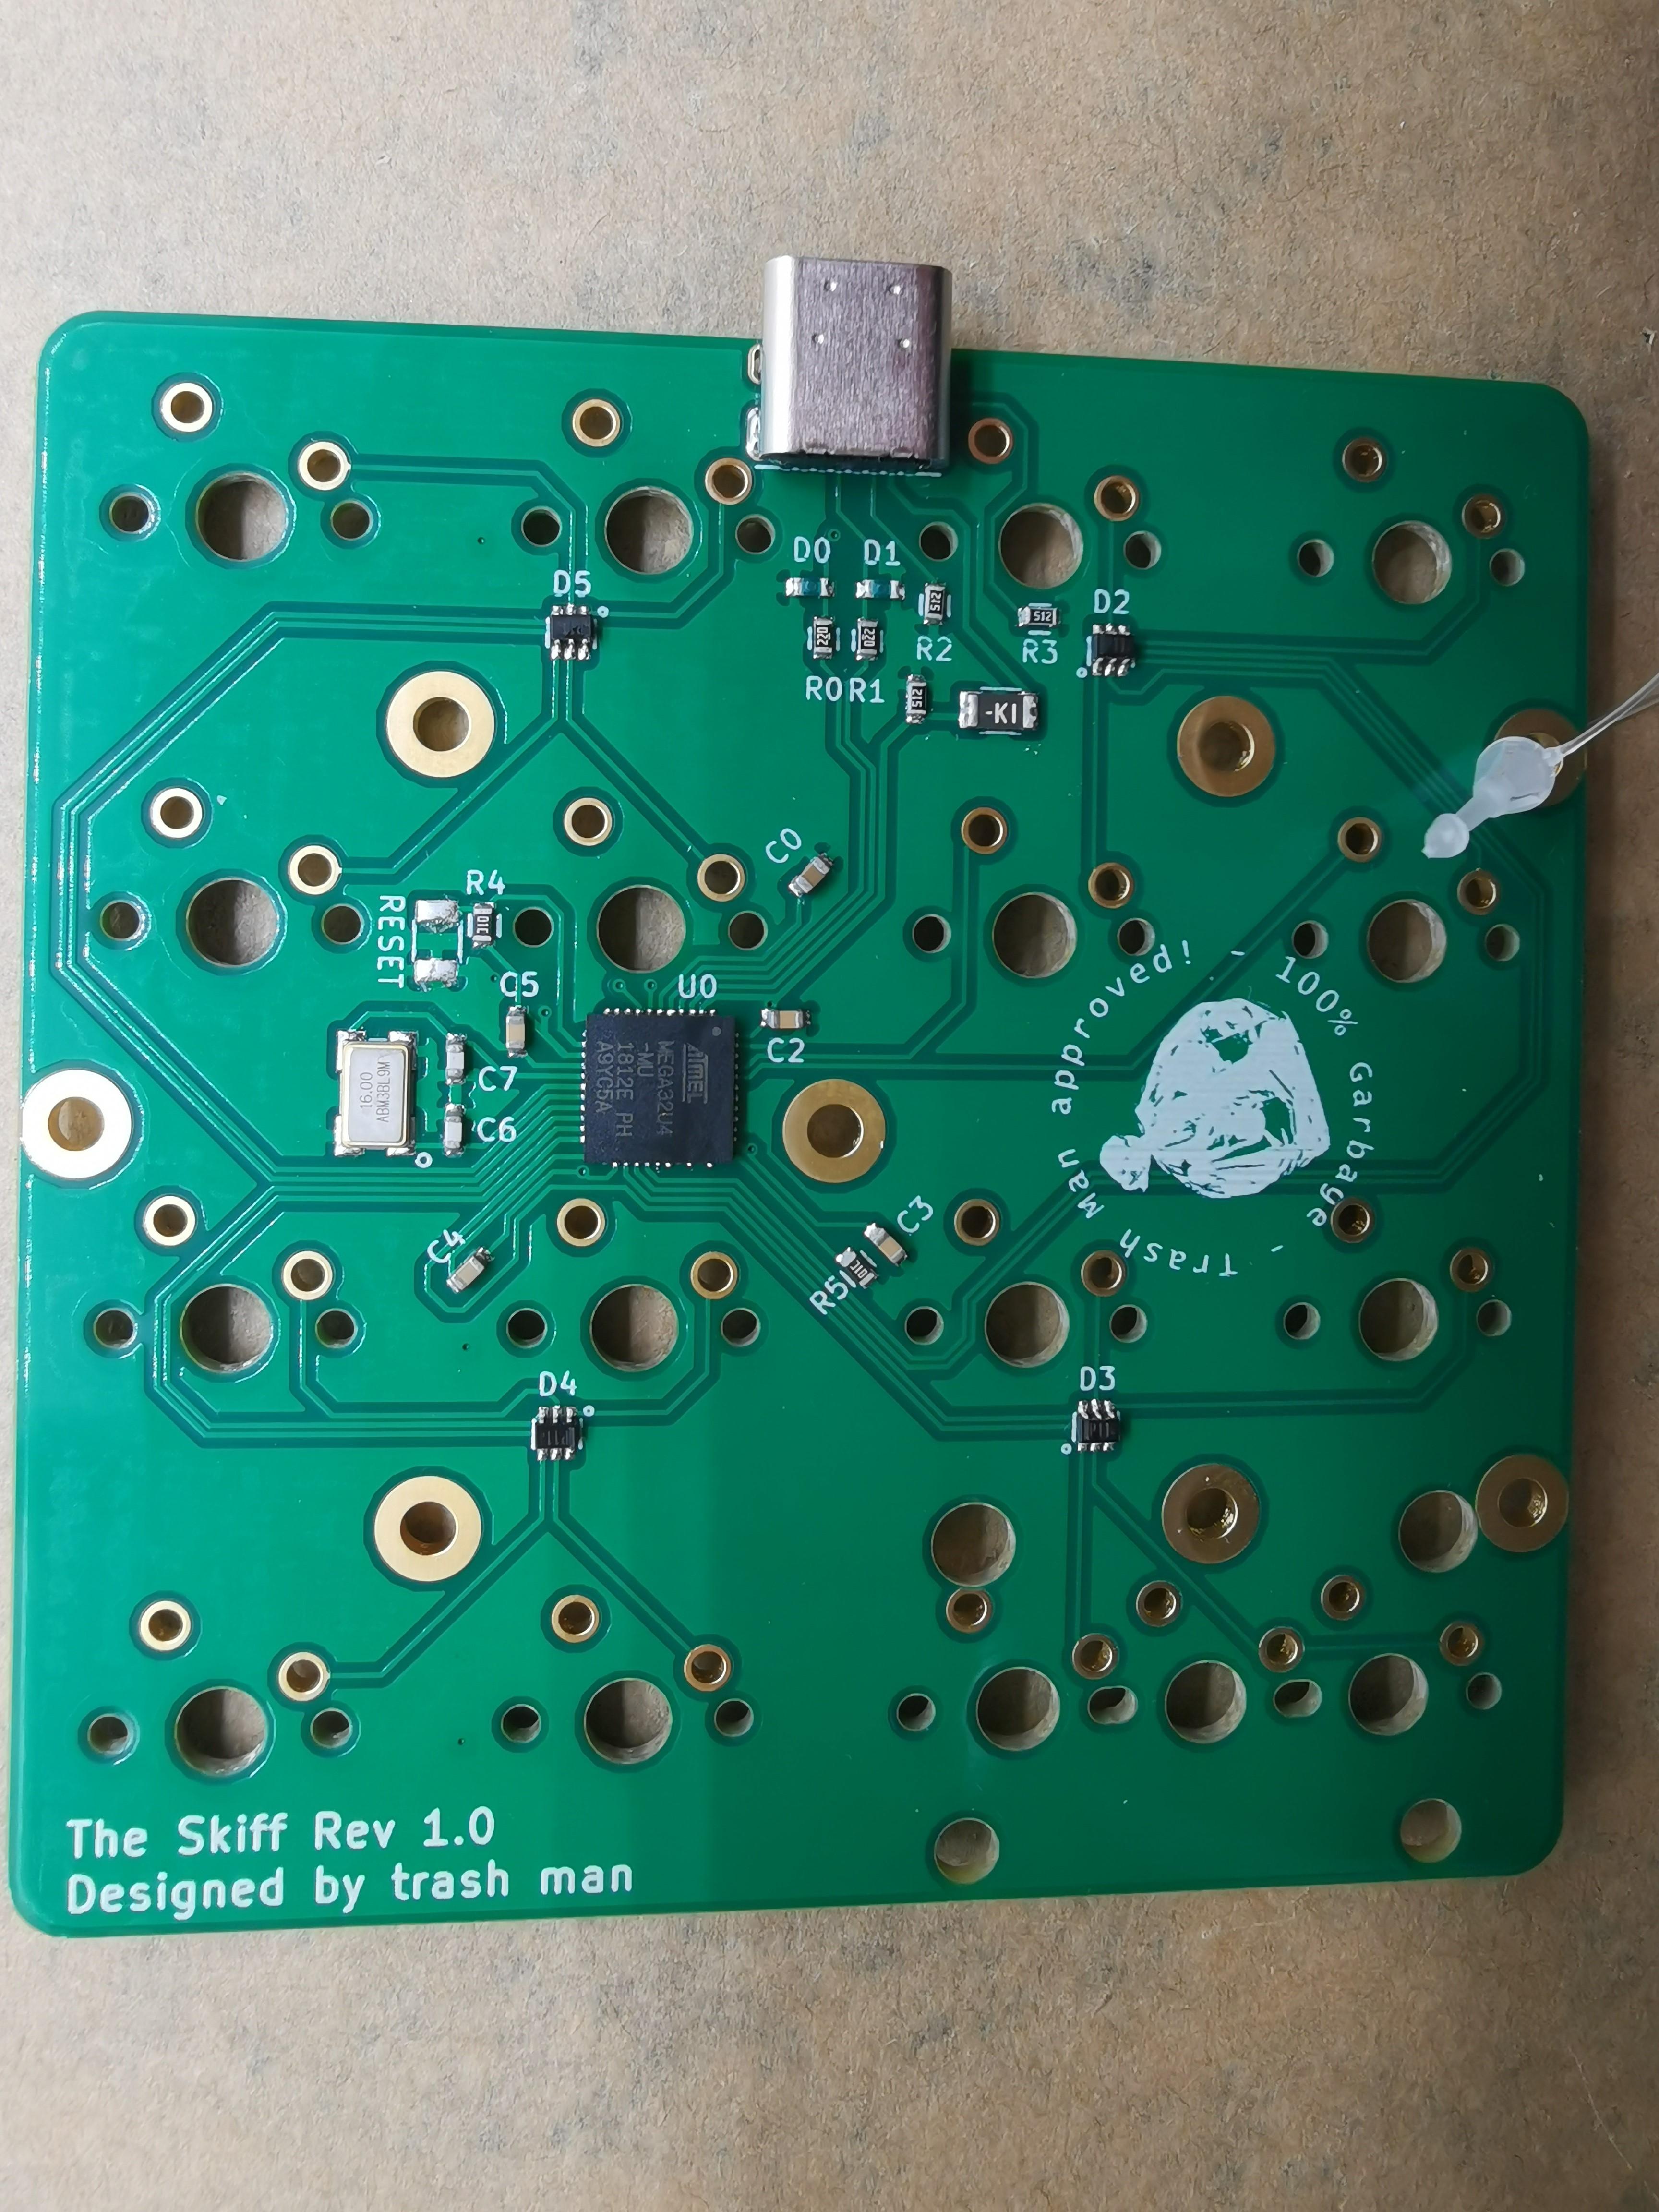 The Skiff PCB back